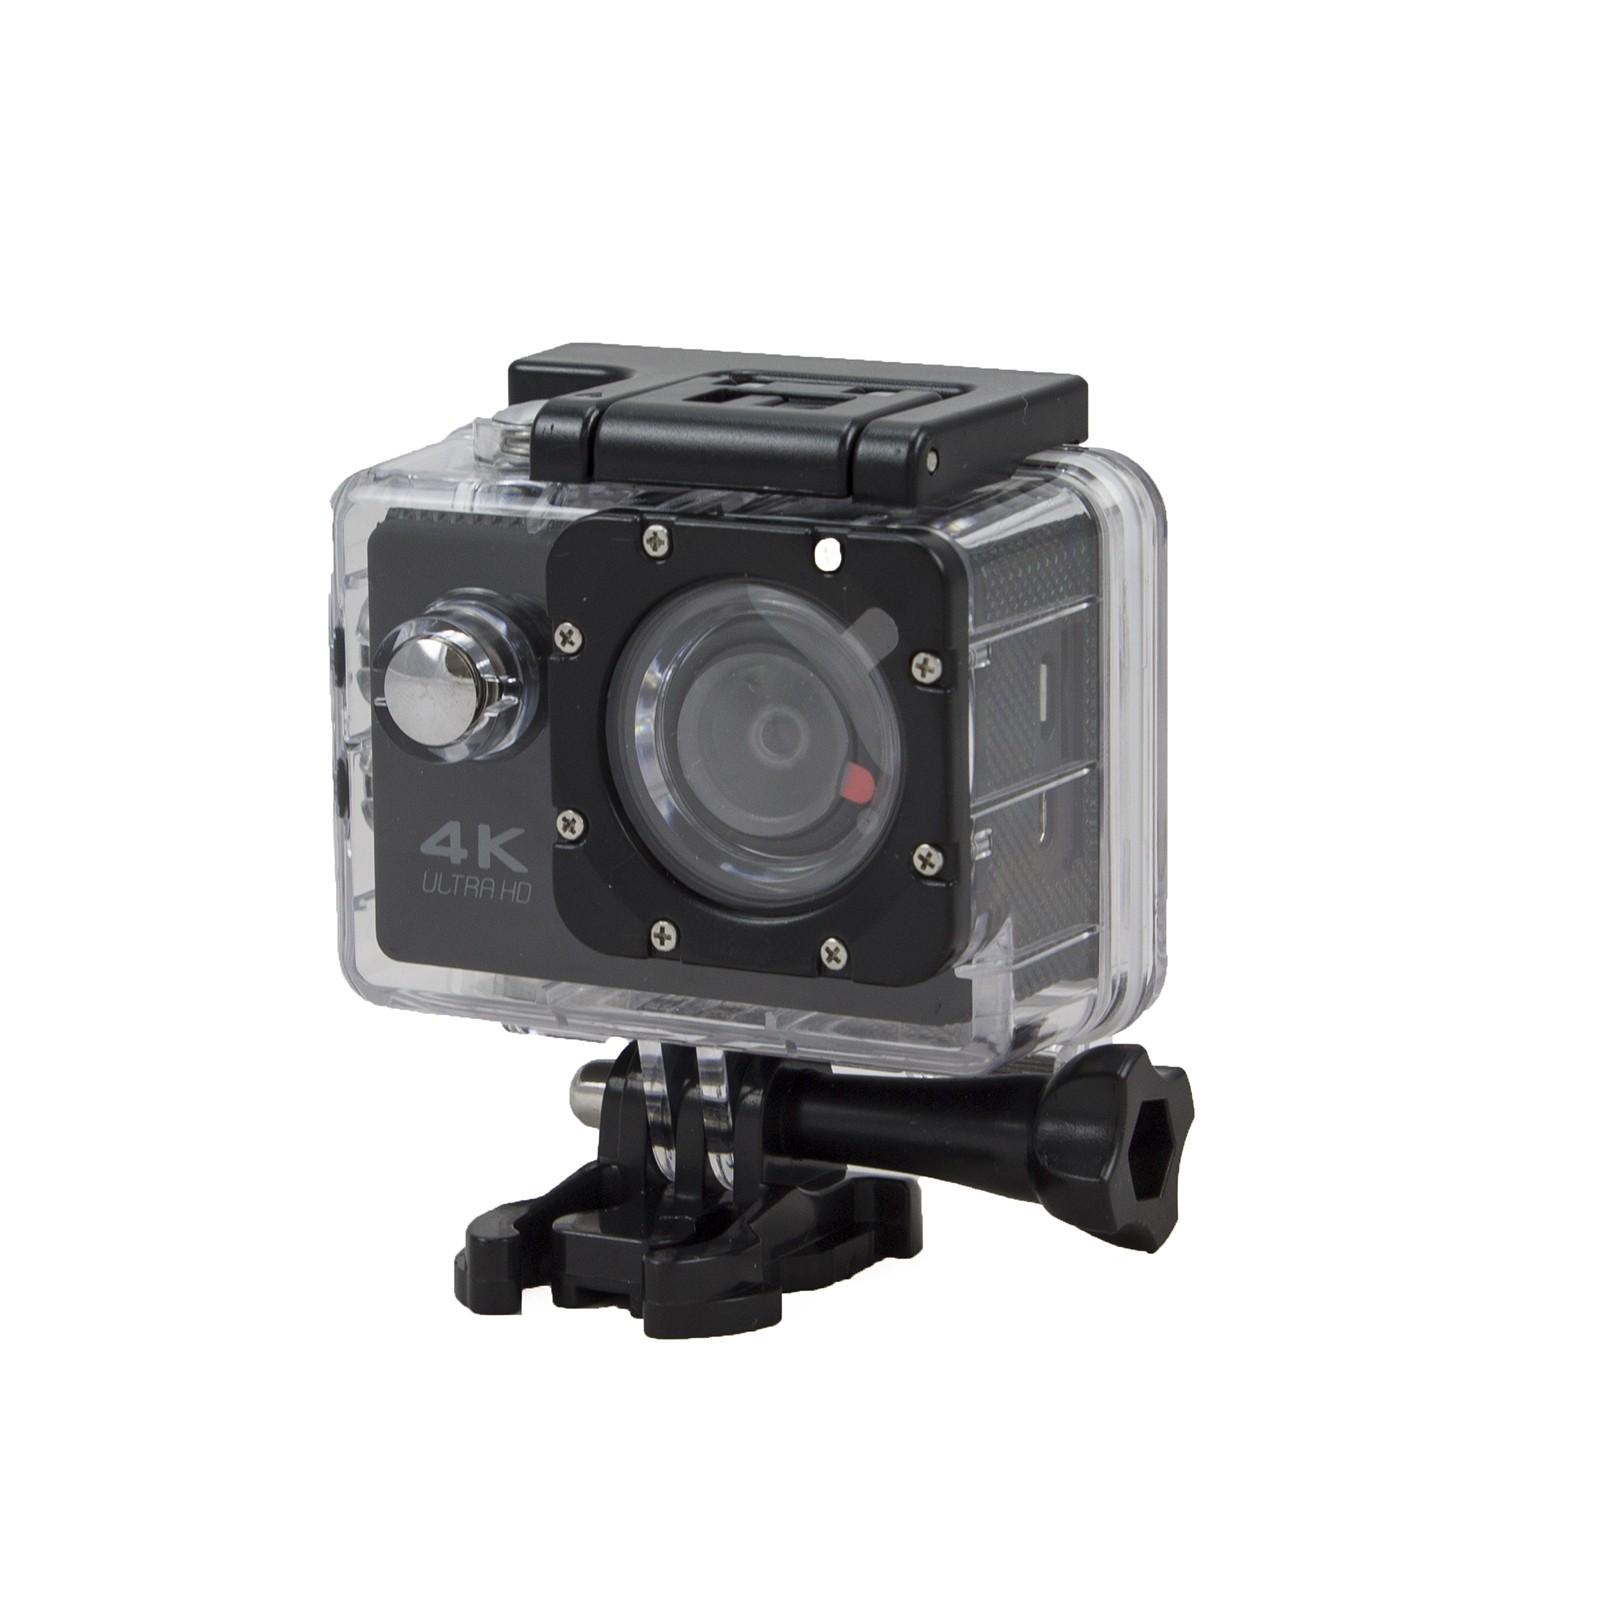 spt4kw 4k ultra hd wifi 12mp waterproof sports camera full hd helmet action cam prices. Black Bedroom Furniture Sets. Home Design Ideas